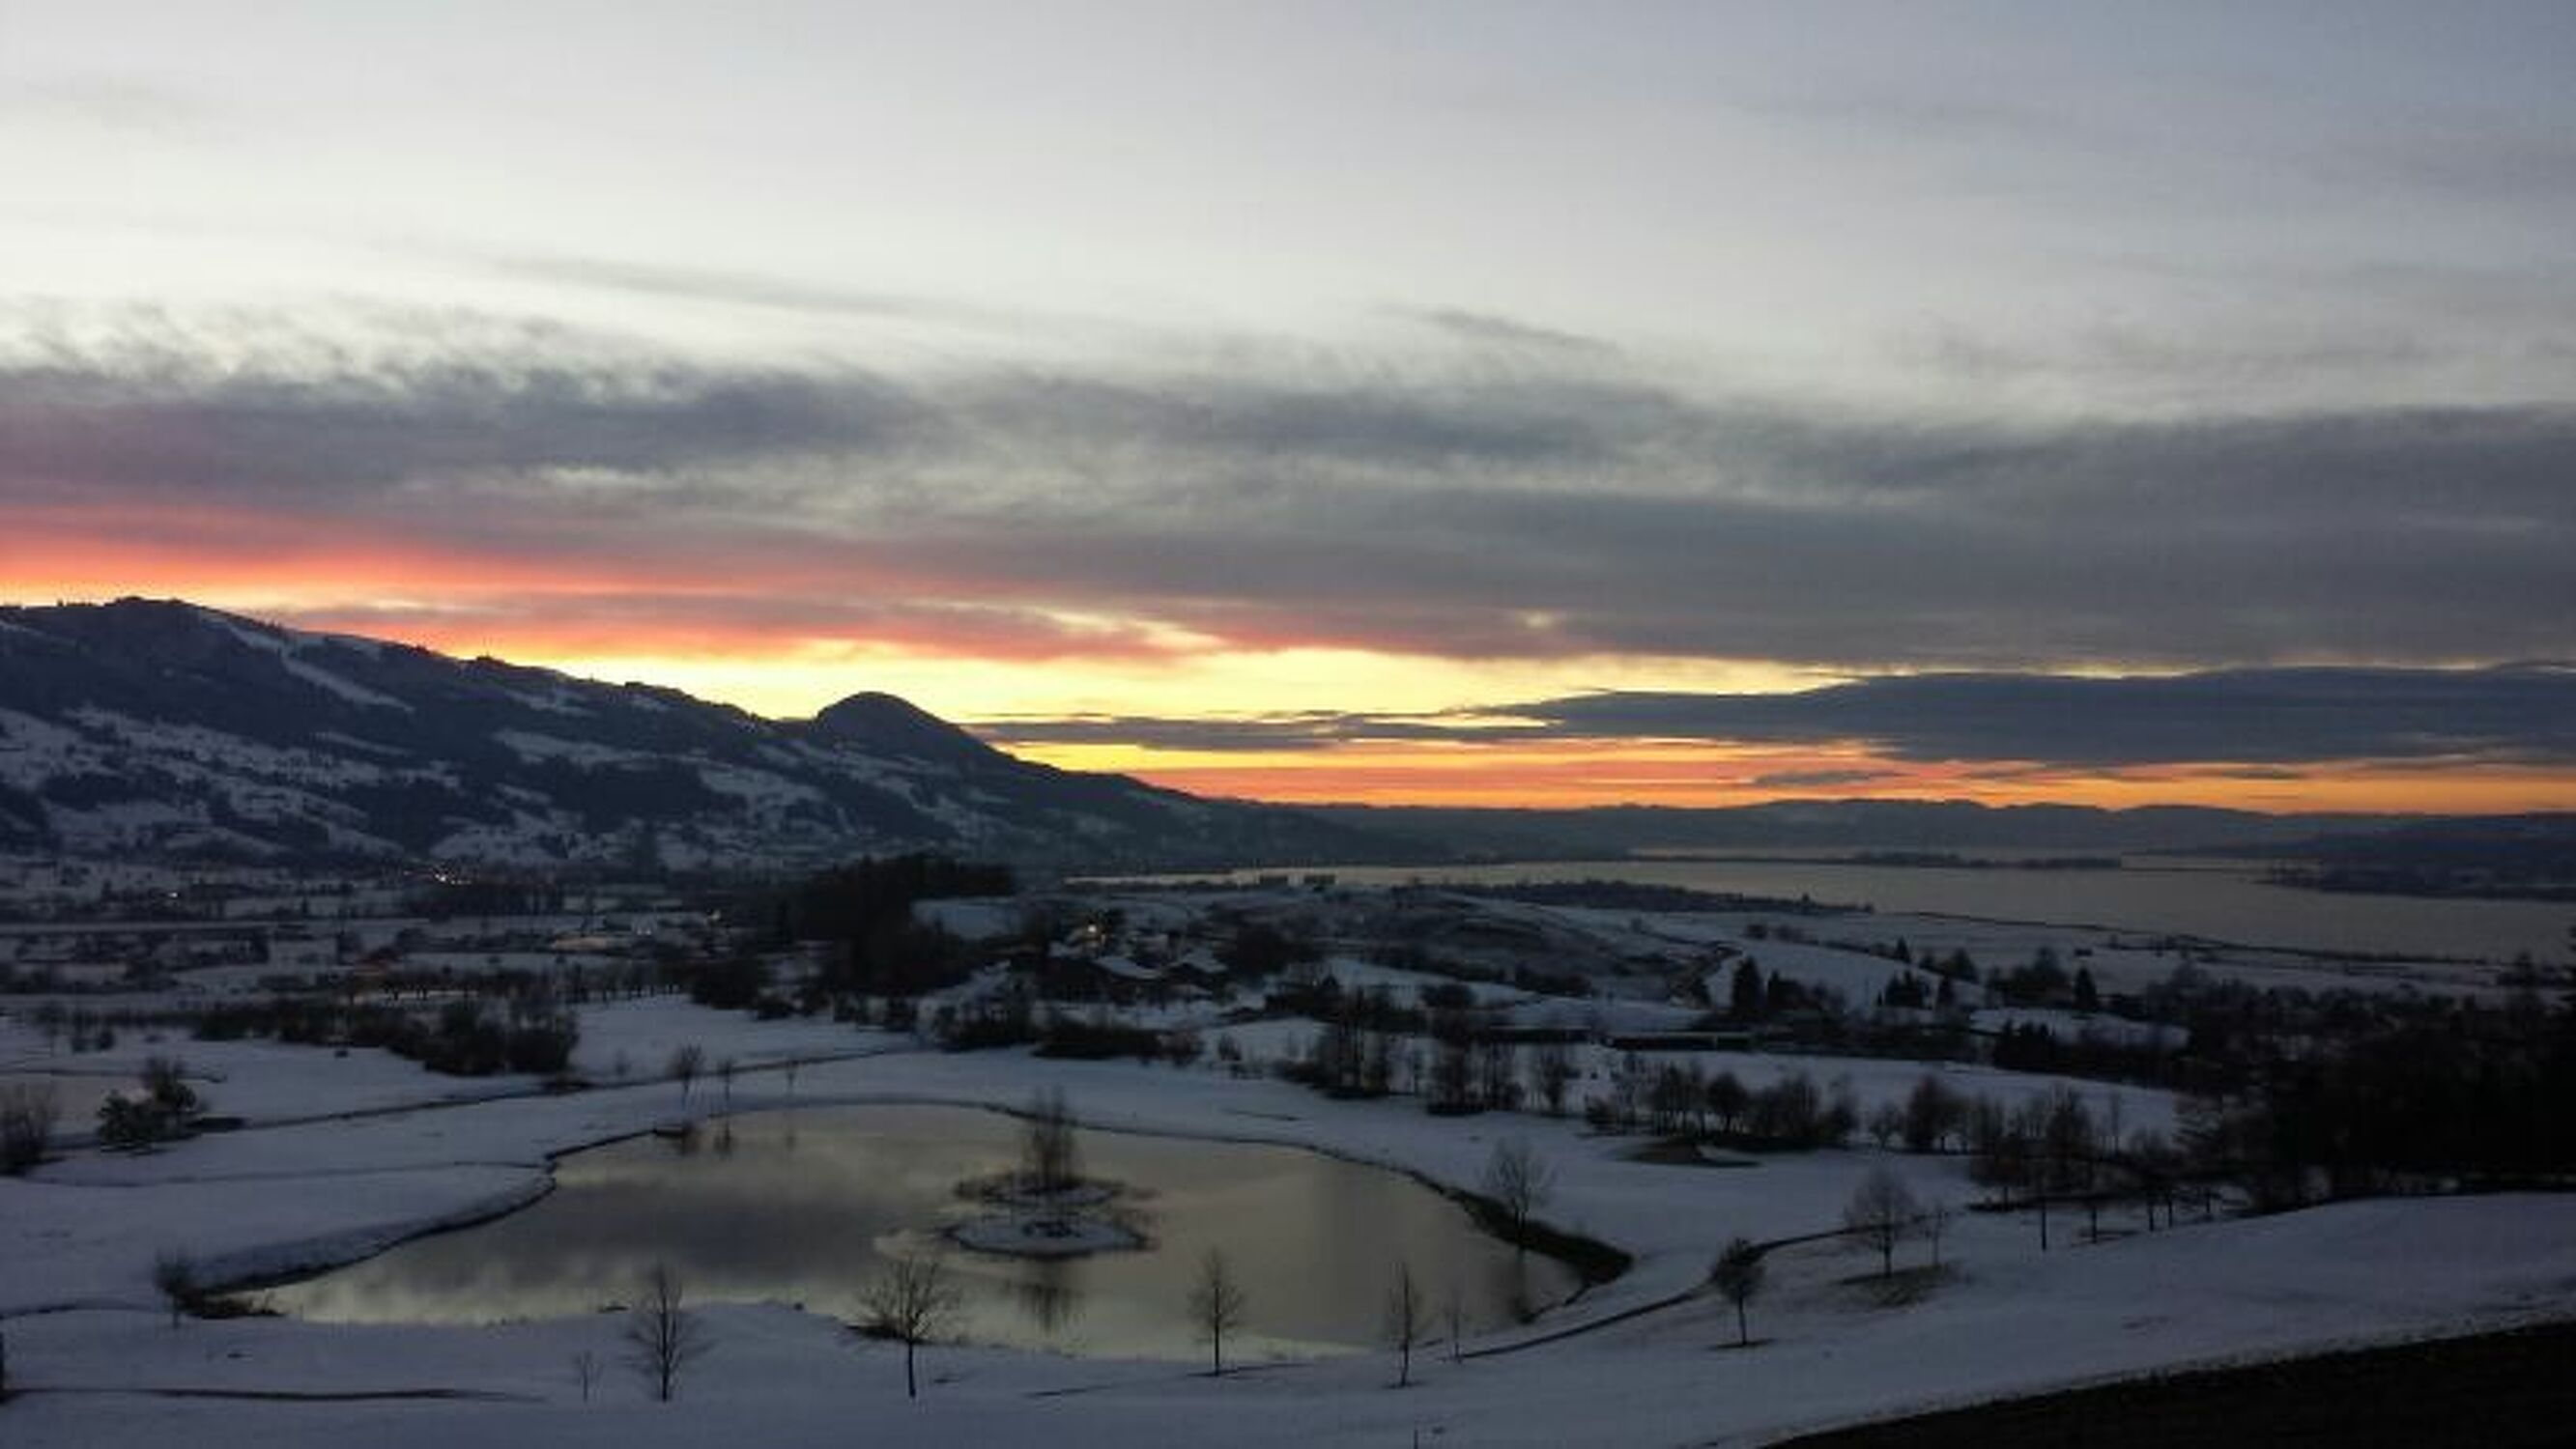 Bild mit Himmel, Sonnenuntergang, Wolkenhimmel, Landschaft